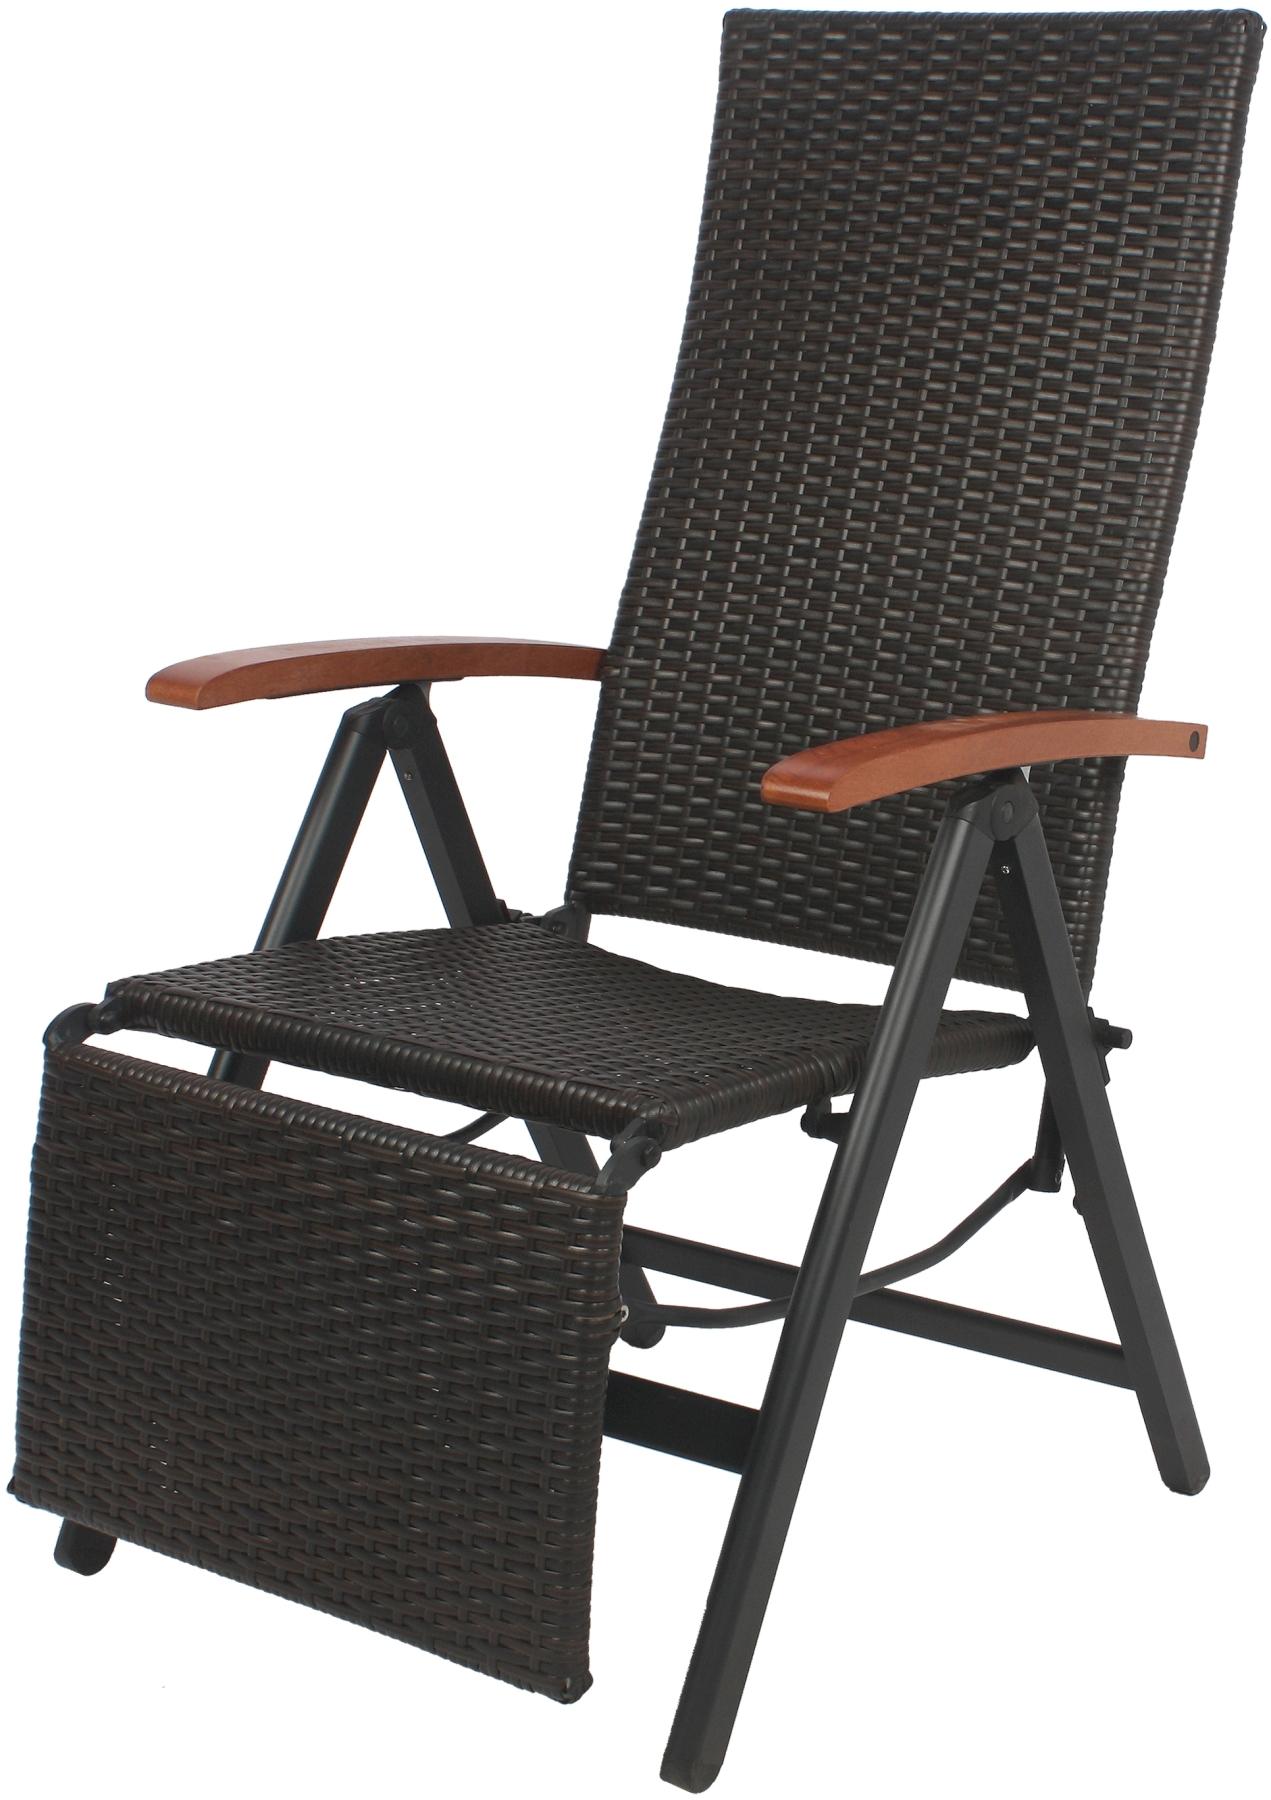 Giardino ay880 rattan aluminium stuhl hochlehner - Rattan giardino ...